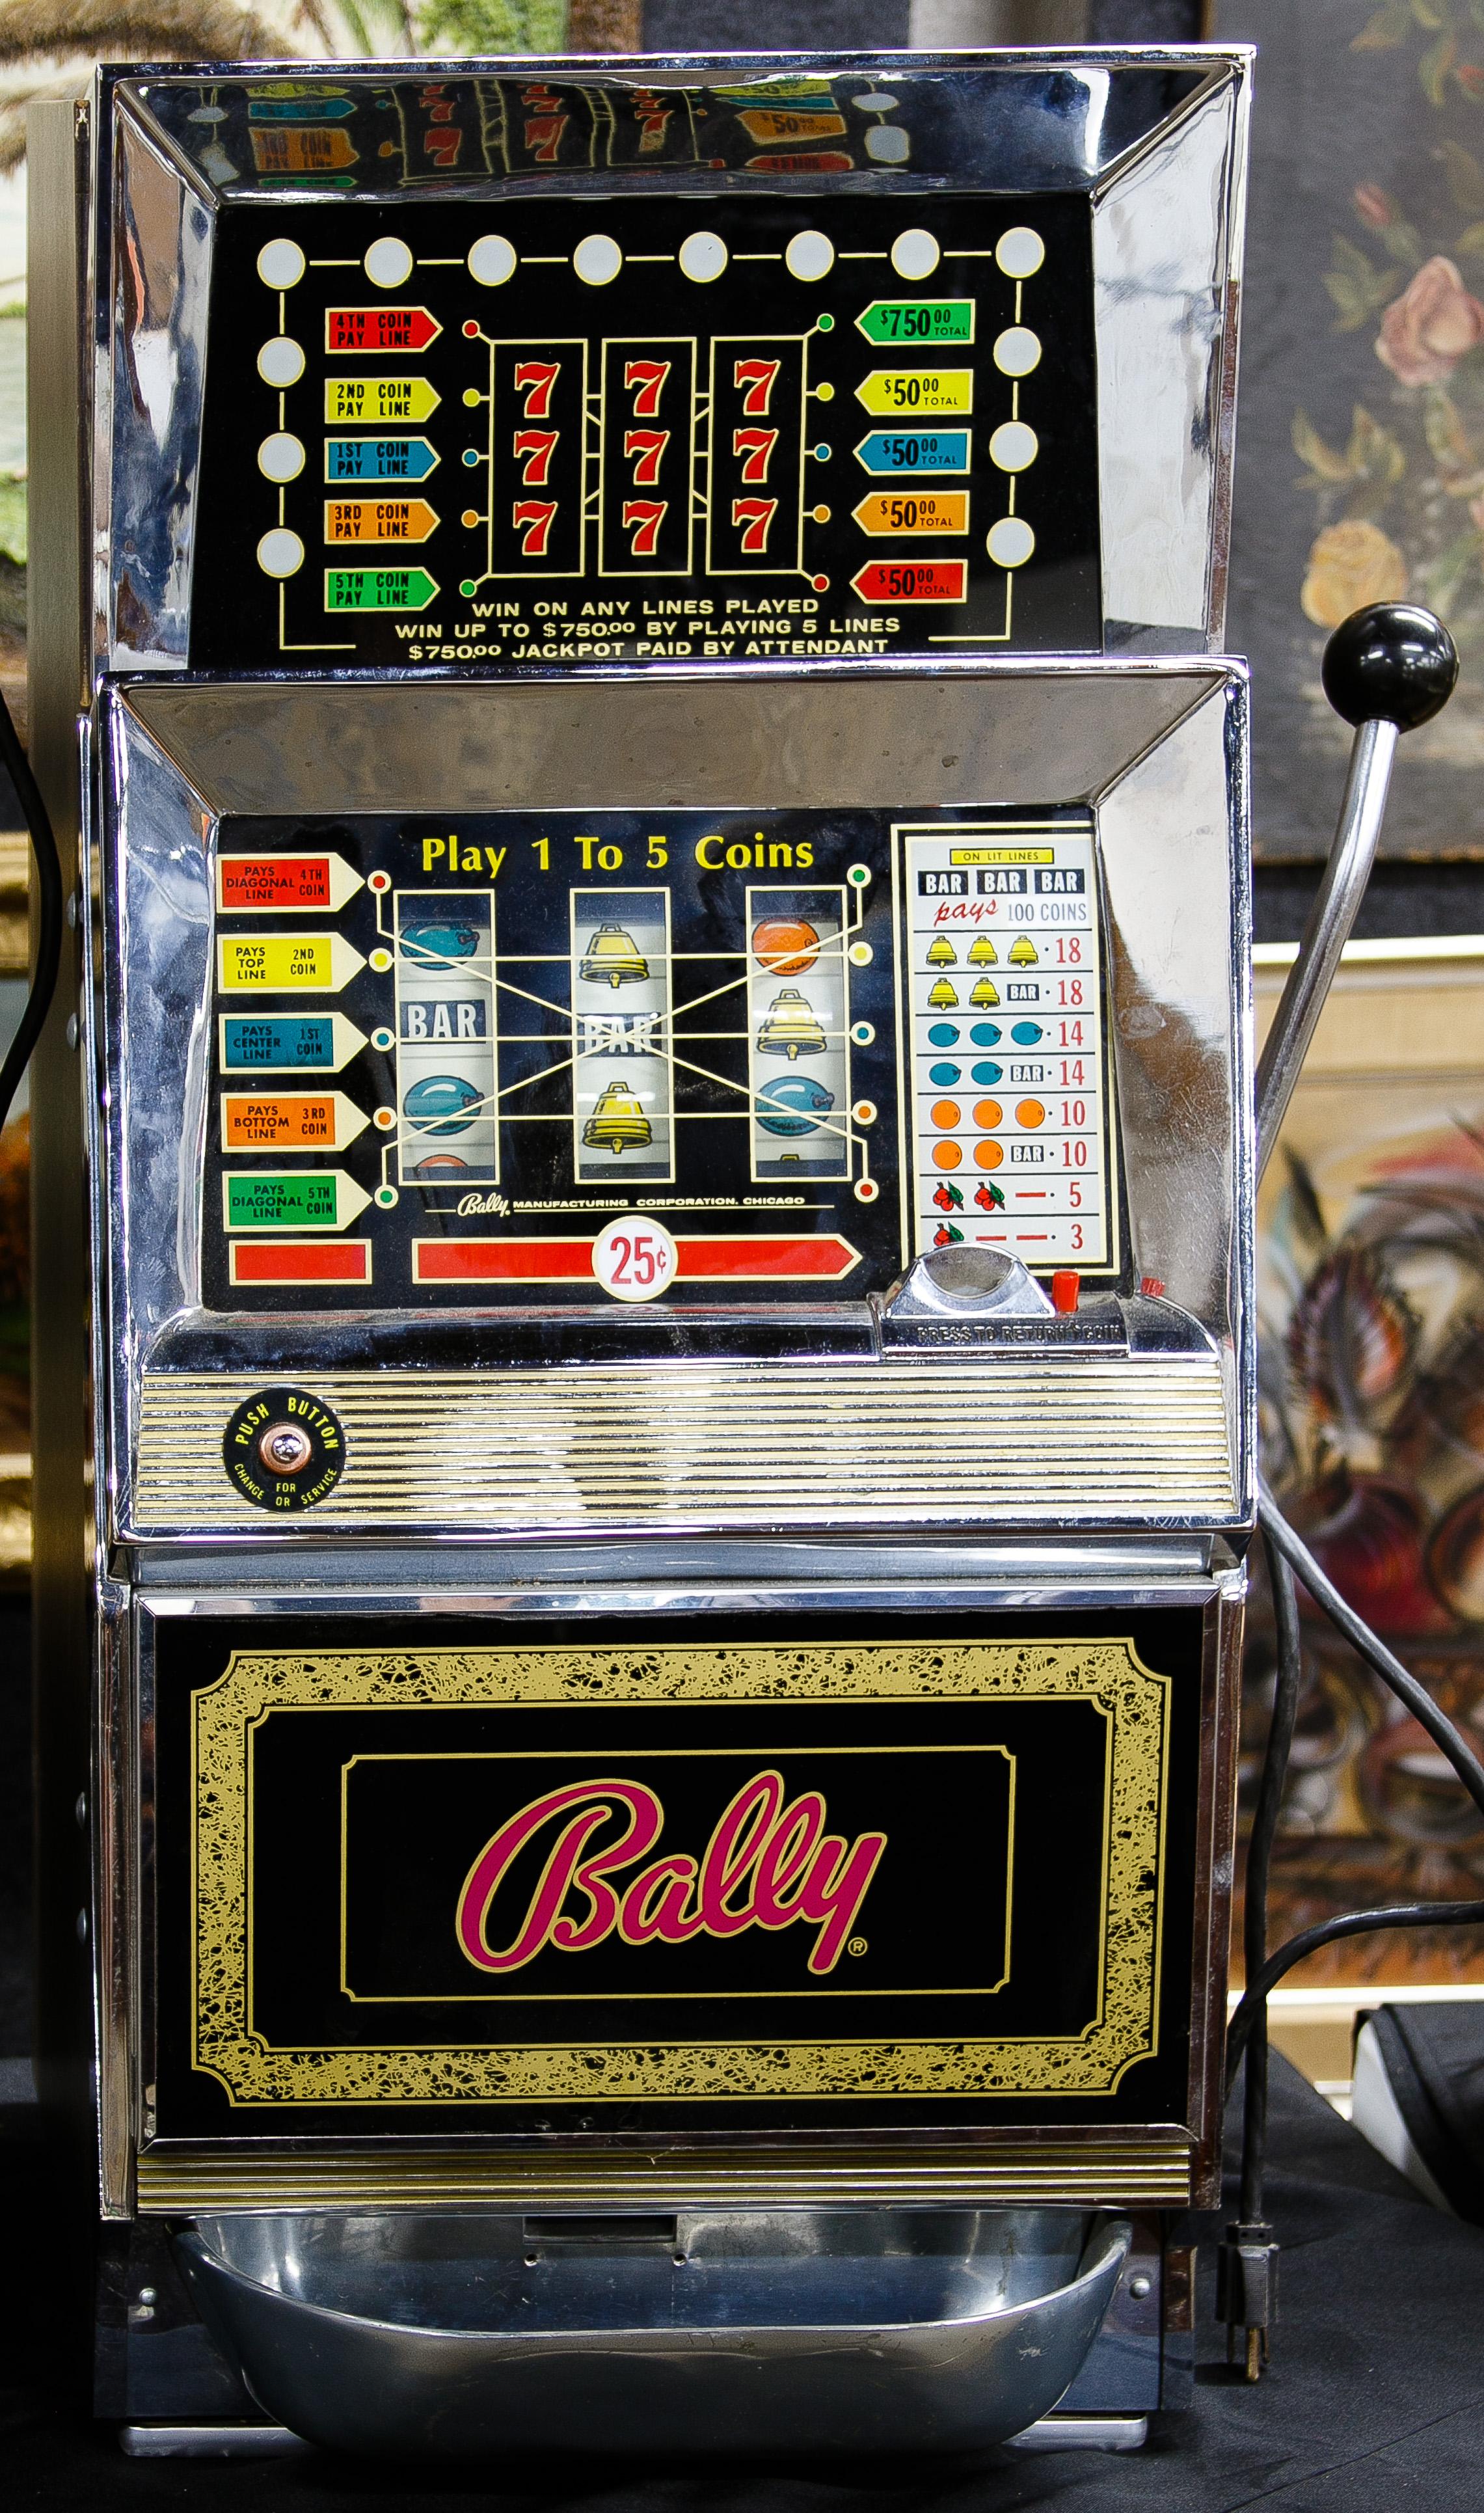 Bally slot machine 5000 plus